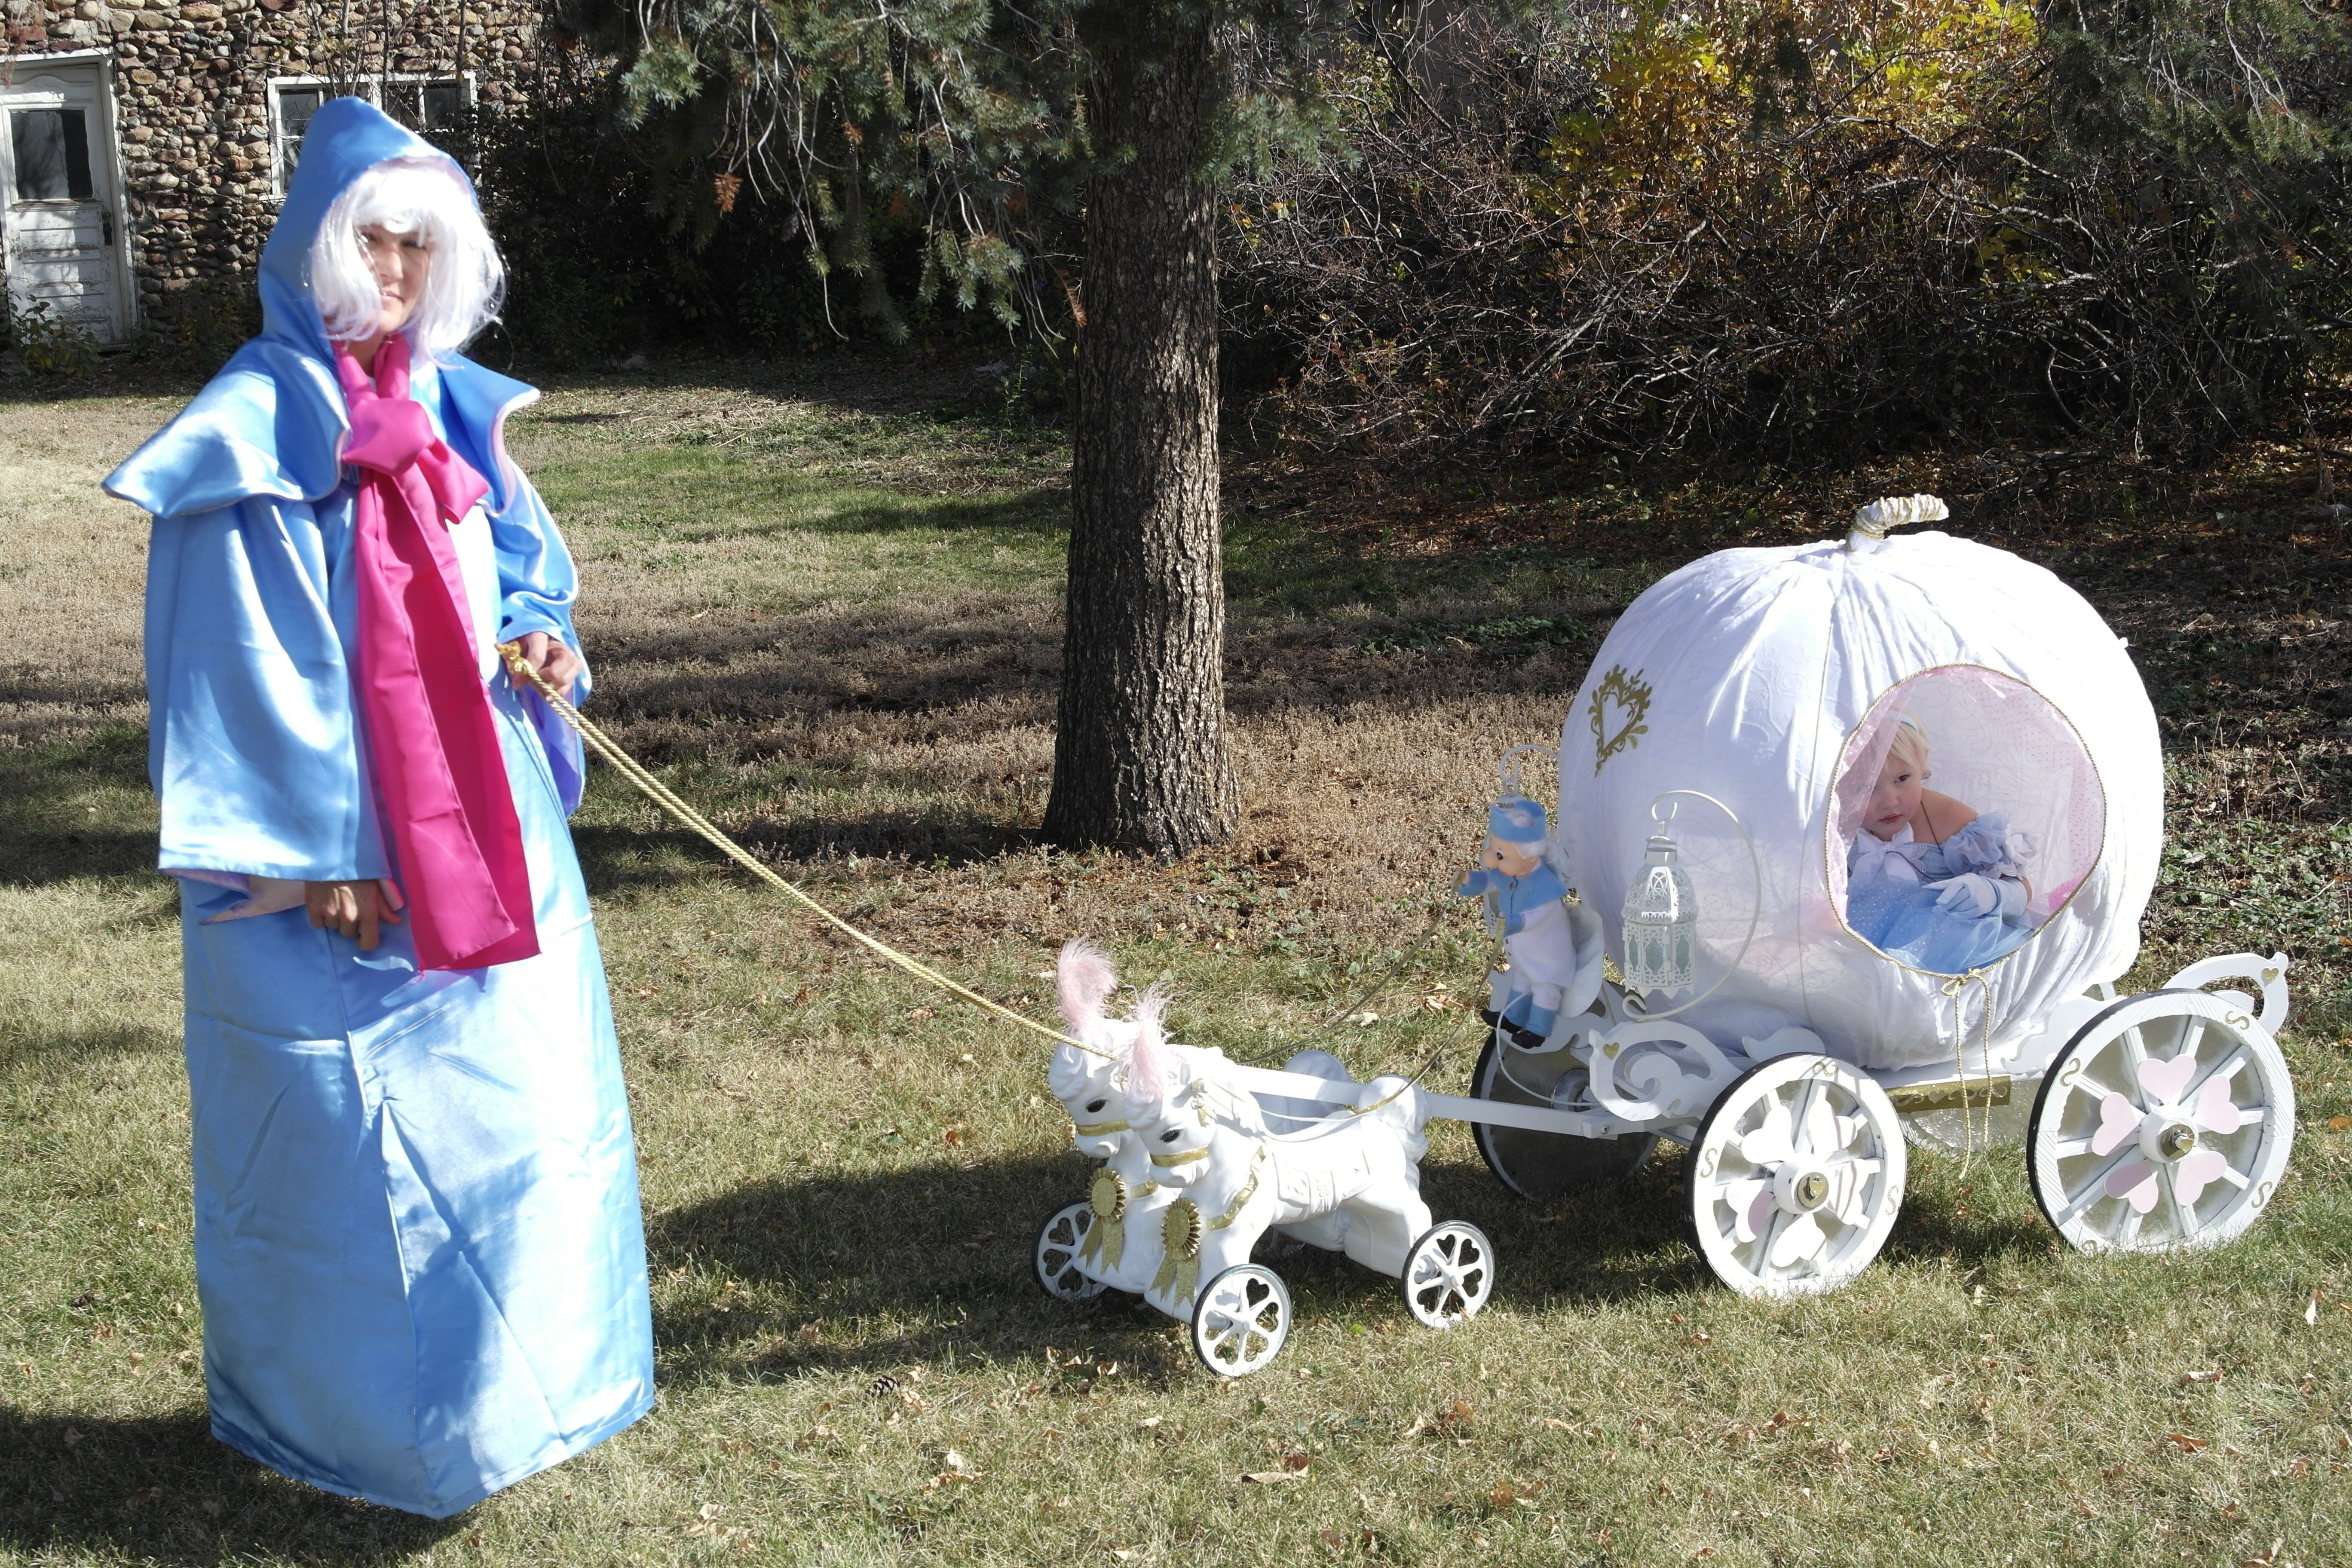 Cinderella S Pumpkin Coach Complete With Horses And Coachman Halloween 2014 Did I Mention I Had Working Lanterns Cenicienta Obras De Teatro